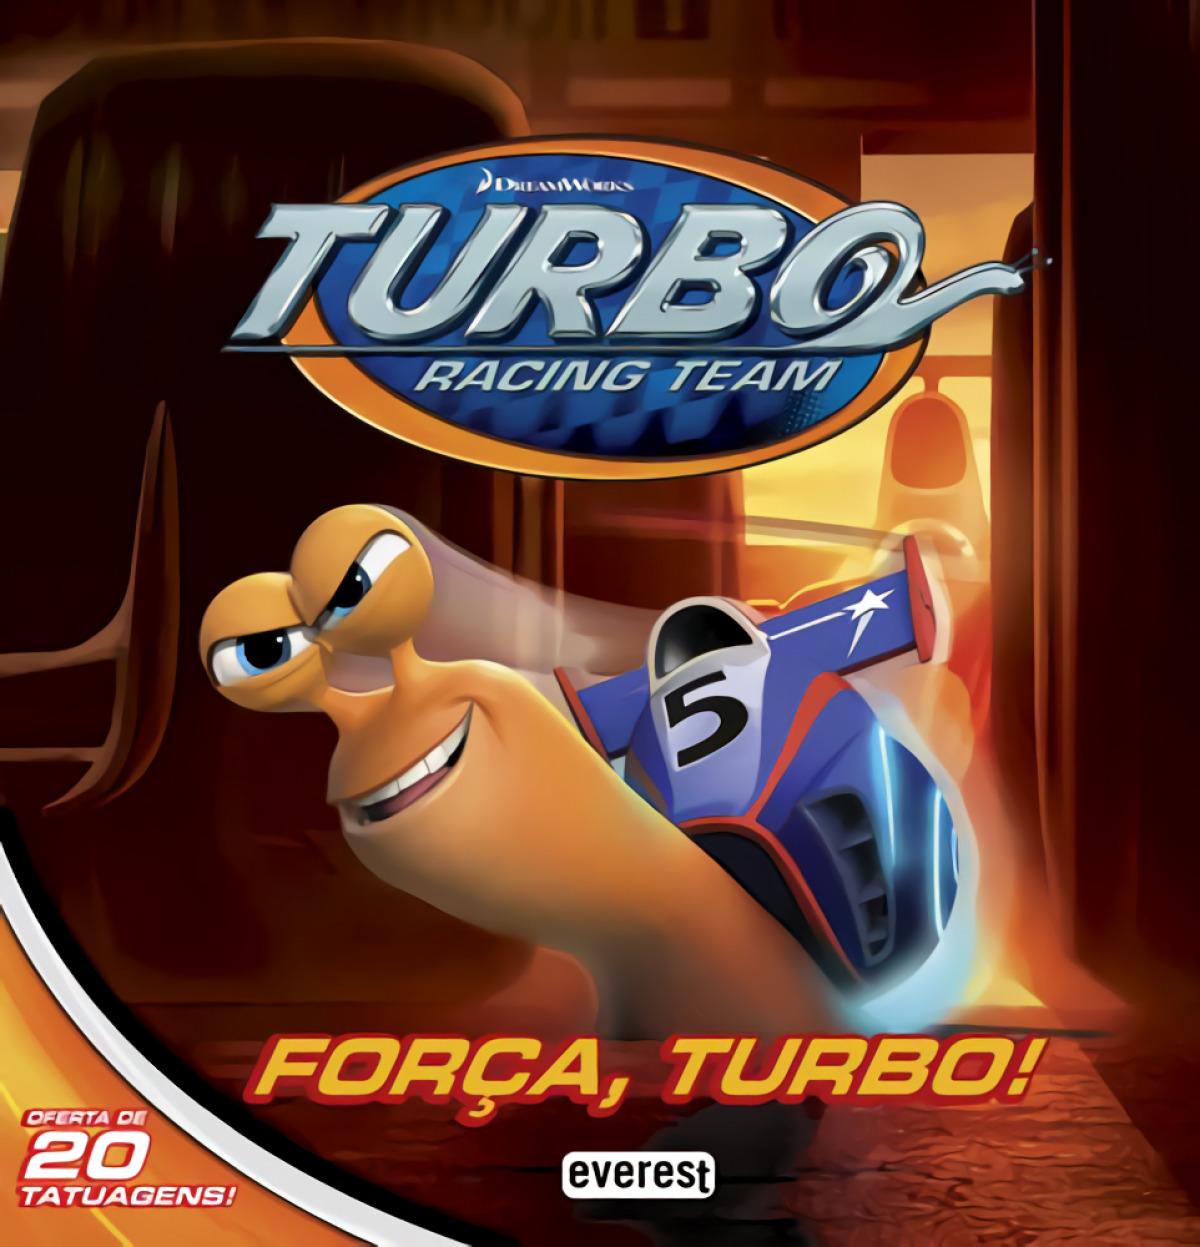 Turbo: forÇa, turbo! - Vv.Aa.